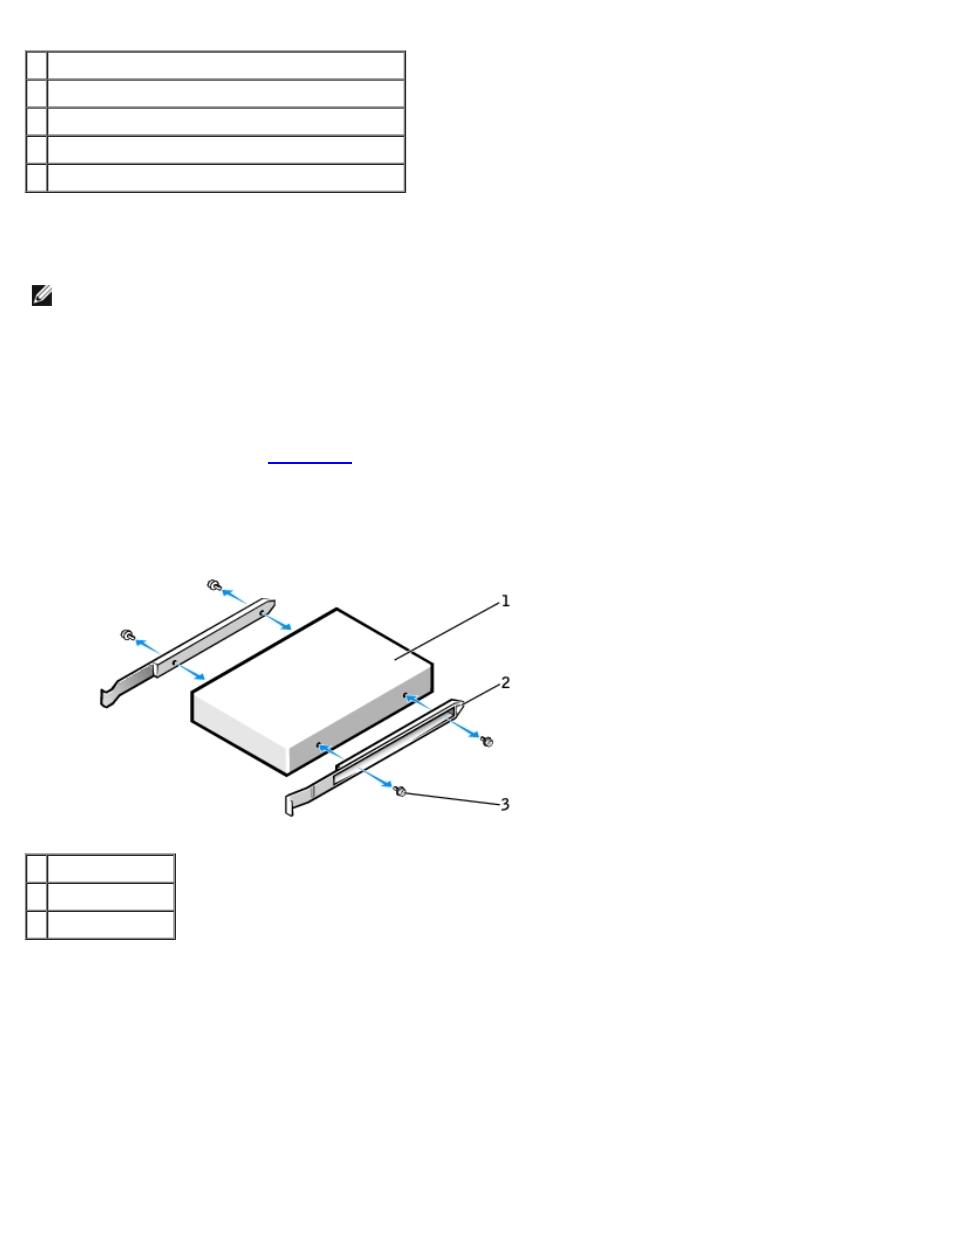 Installing a cd/dvd drive | Dell Precision 470 User Manual